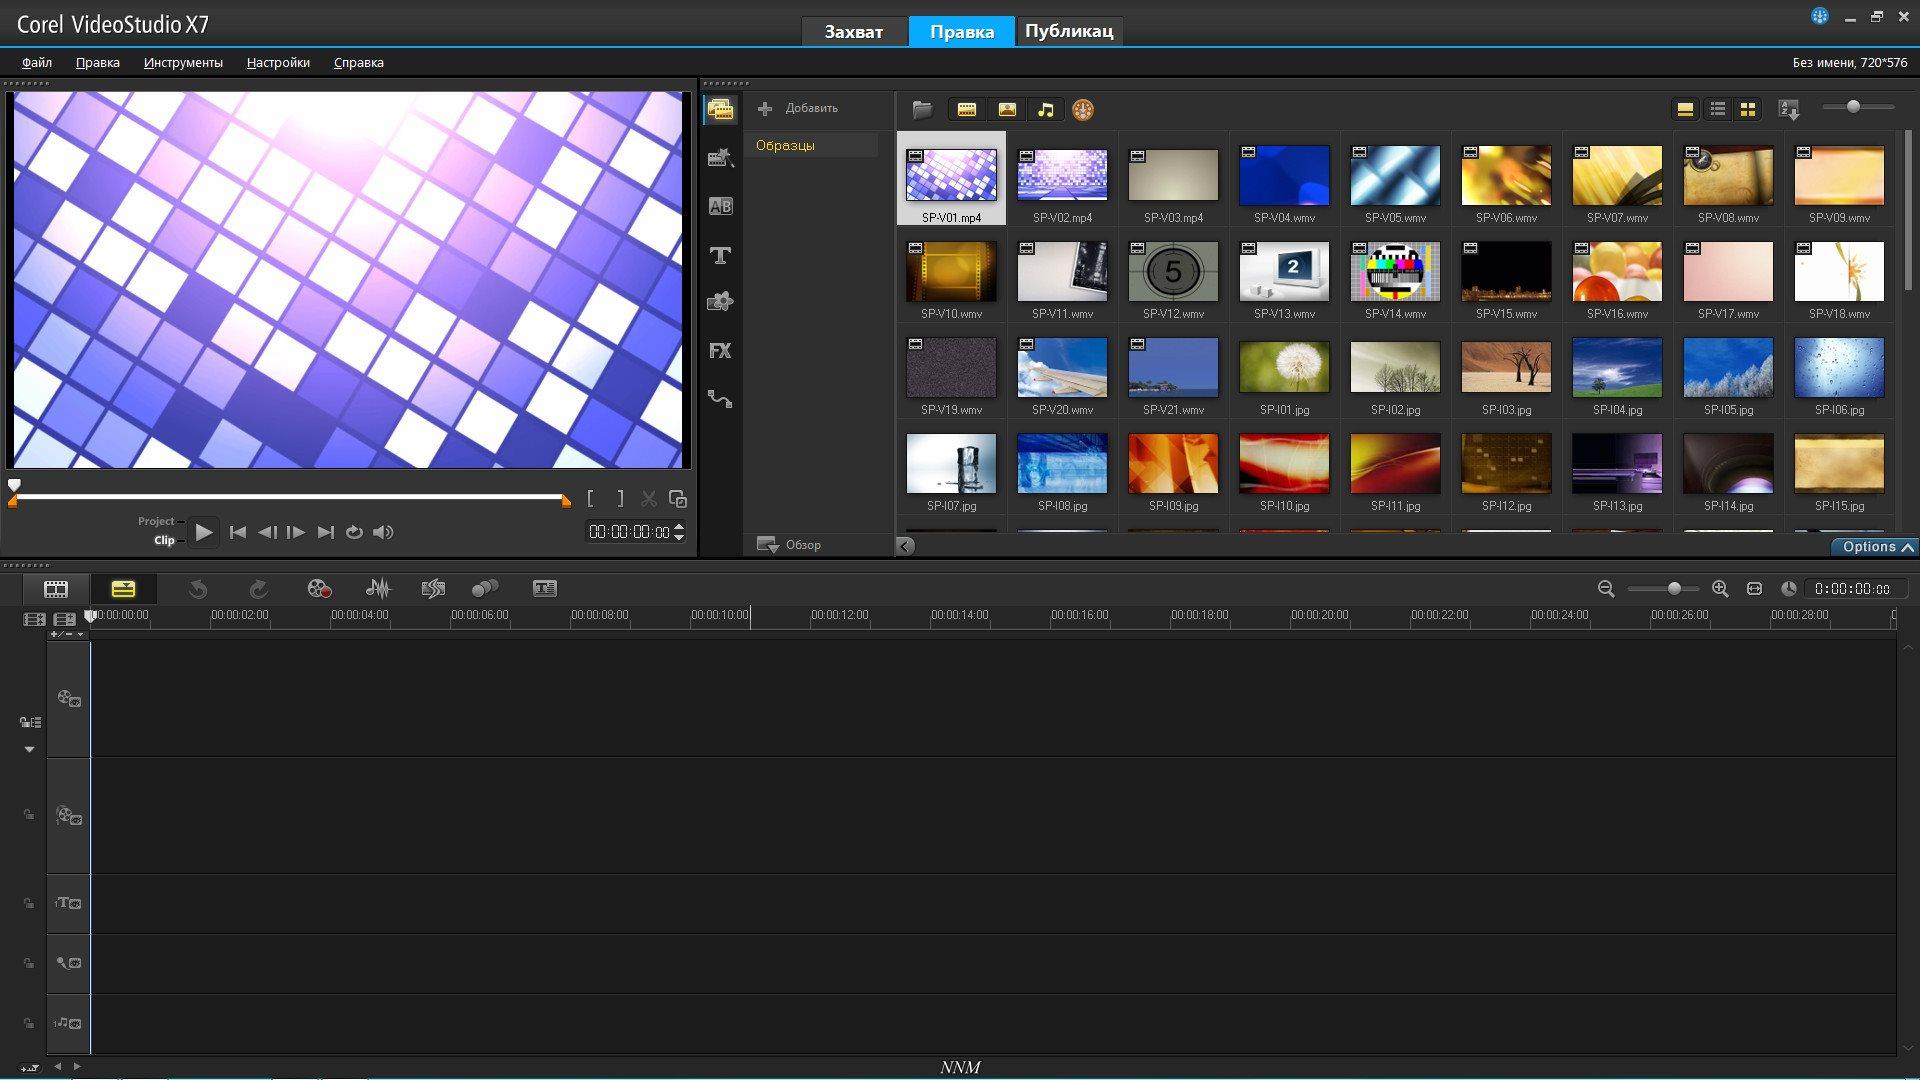 Corel videostudio pro x7 торрент rus